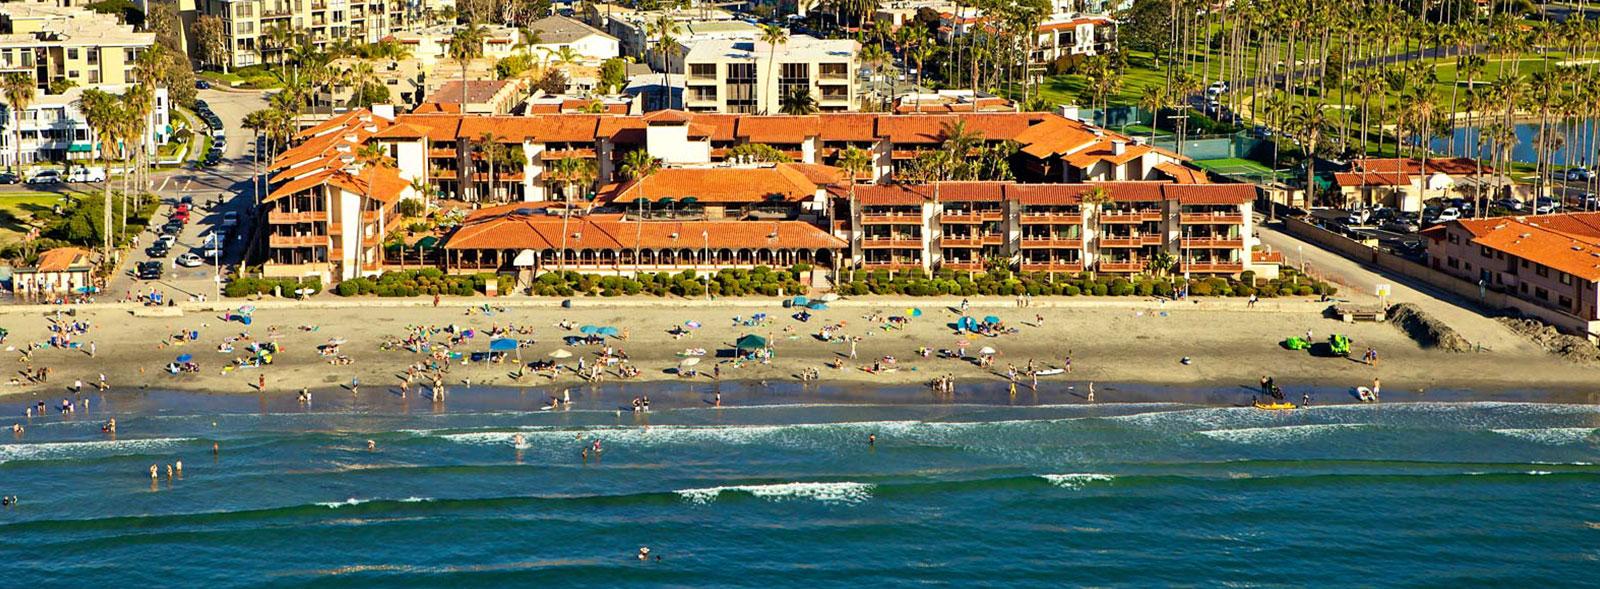 The Beach of La Jolla Shores Hotel